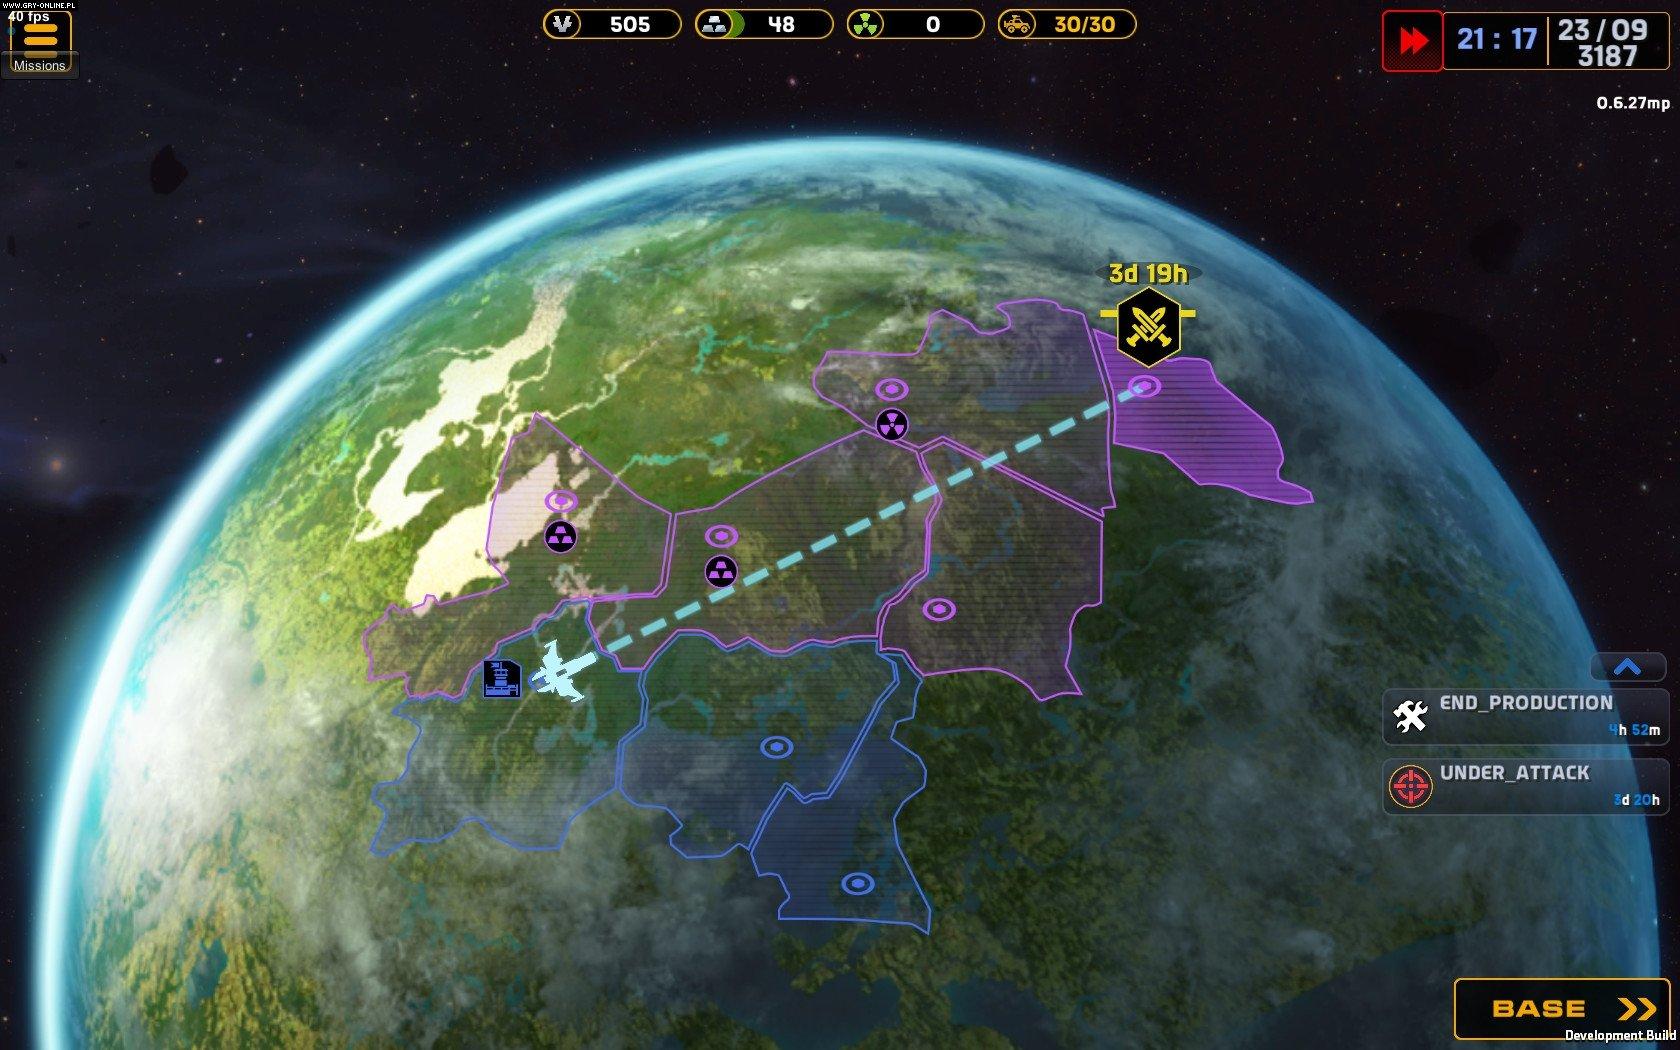 Codex of Victory PC Games Image 2/14, Ino-Co, 1C